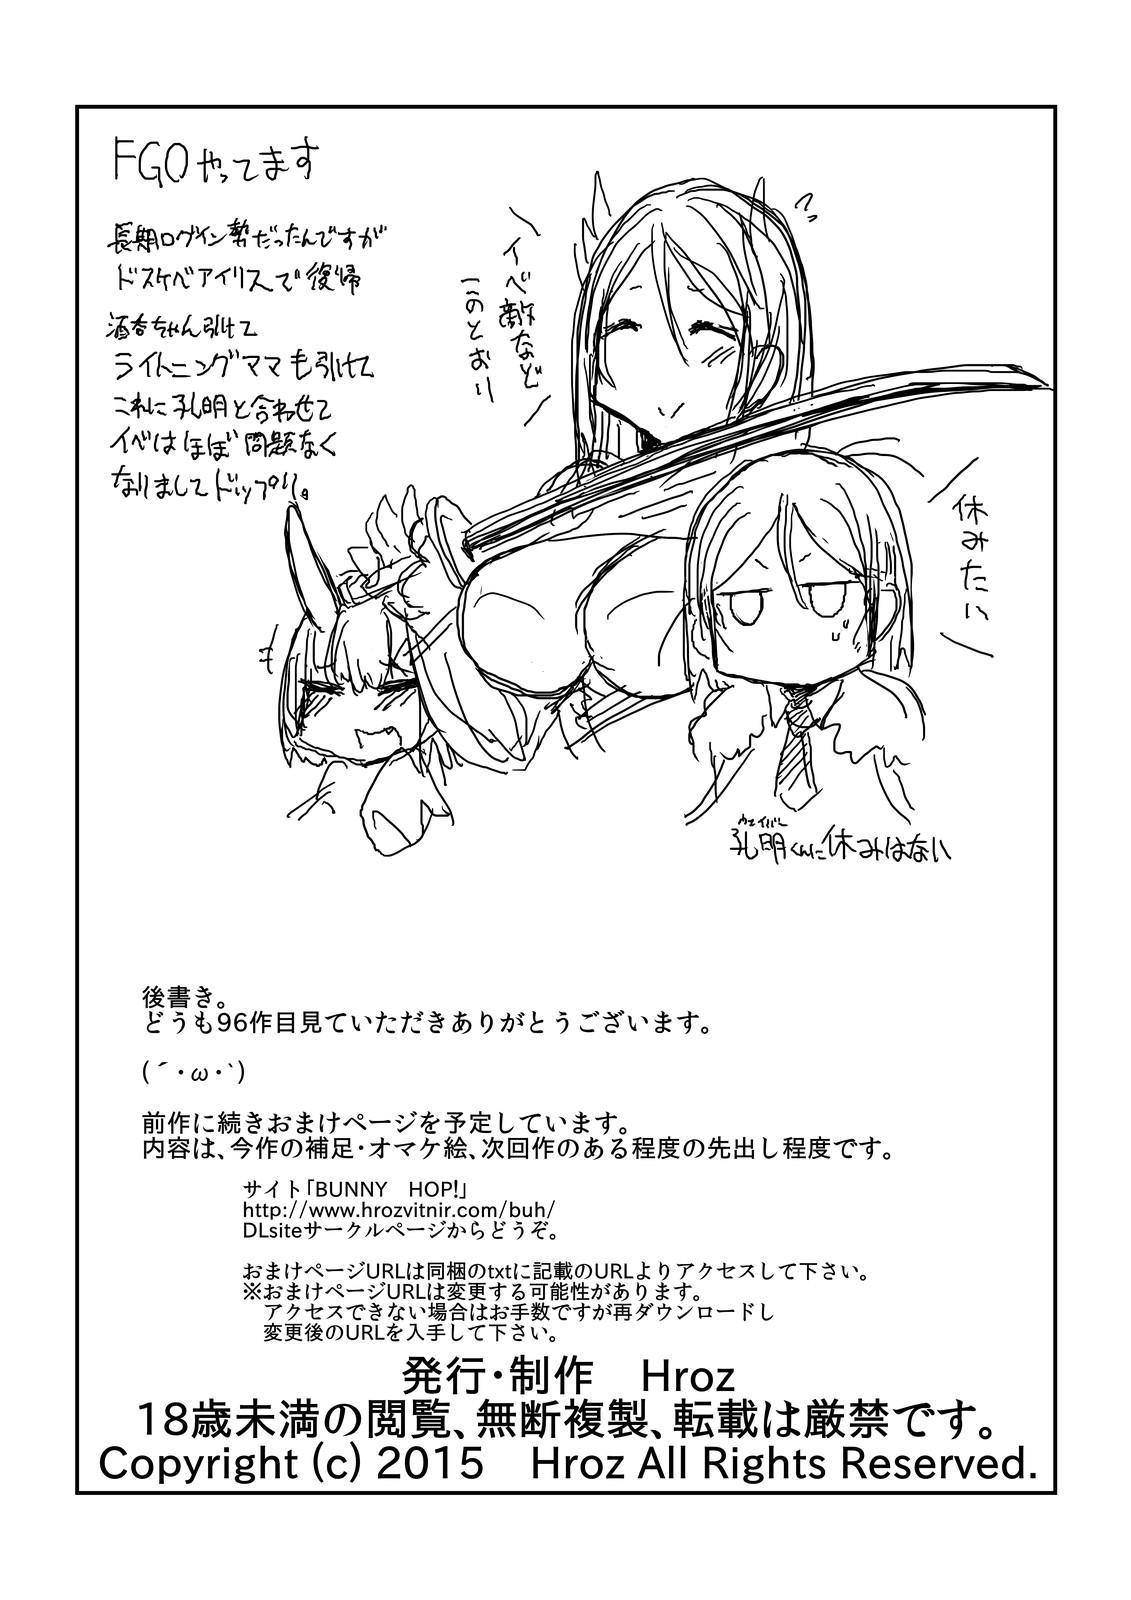 [Hroz] Ishuzoku to Dekiru Shoukan -Scylla-san Hen- | Interspecies Brothel ~Miss Scylla's Chapter~ [English] {just om3ga} [Digital] 13